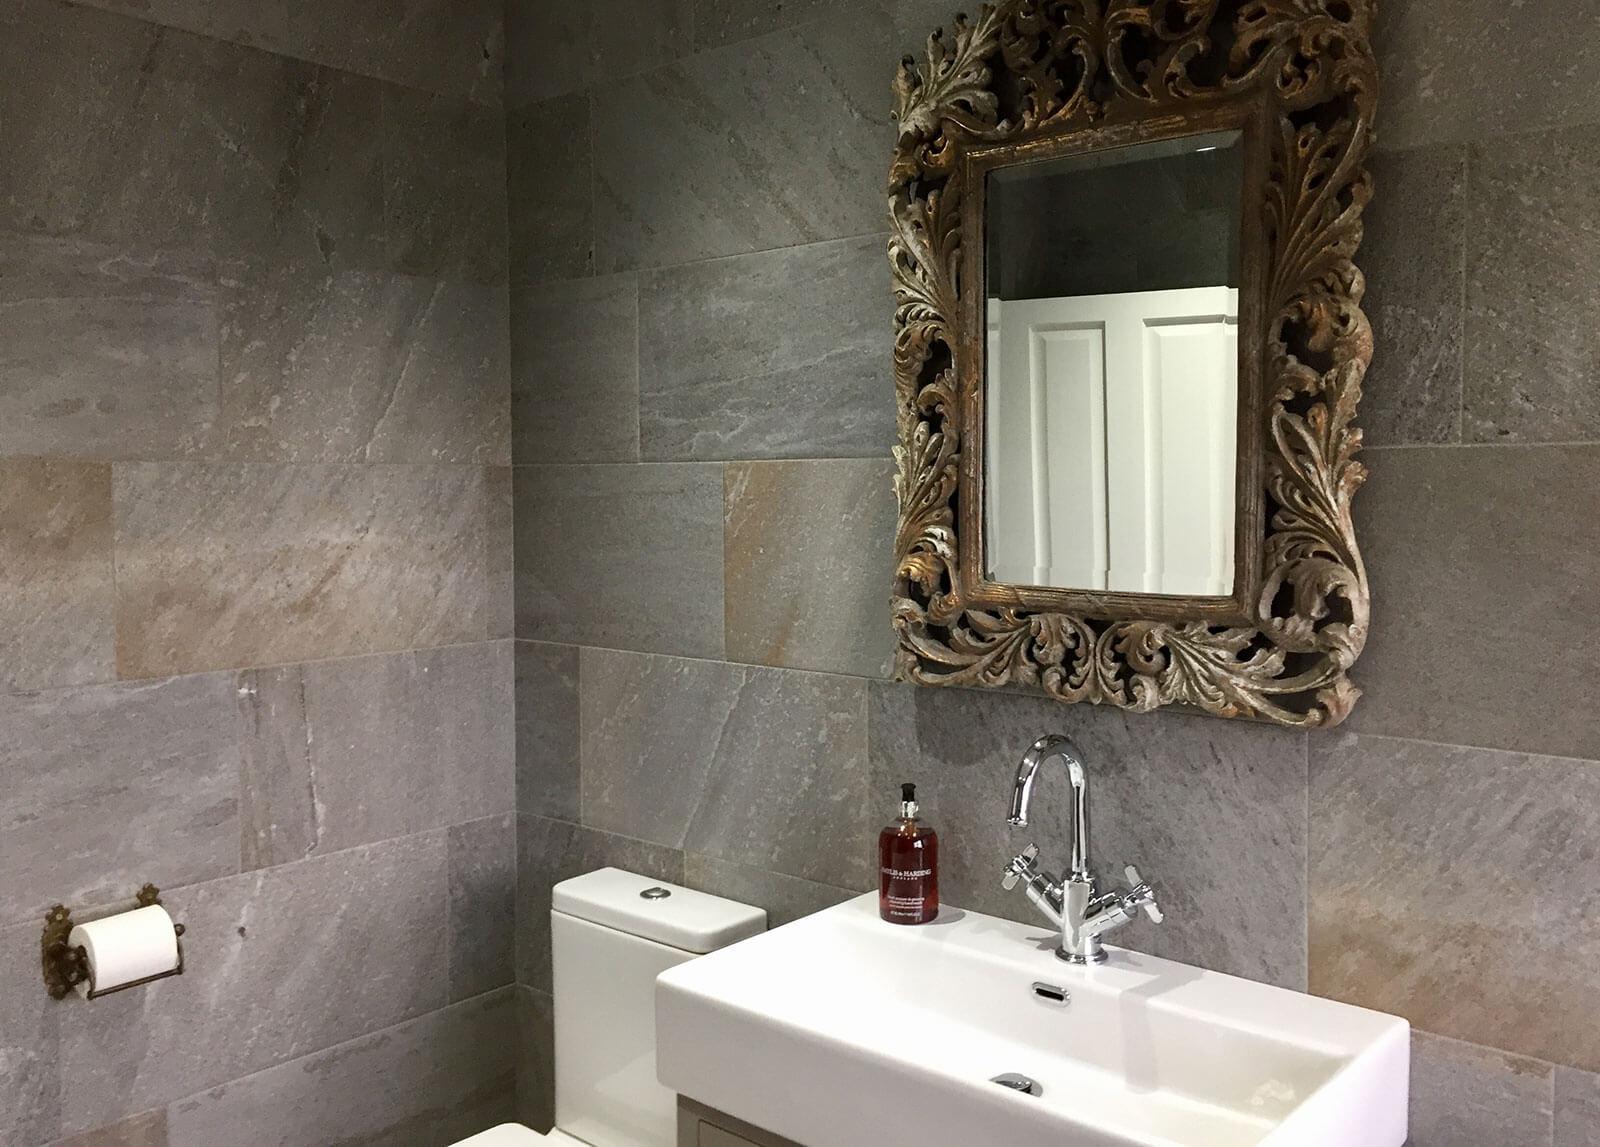 Shropshire wall & floor tiles